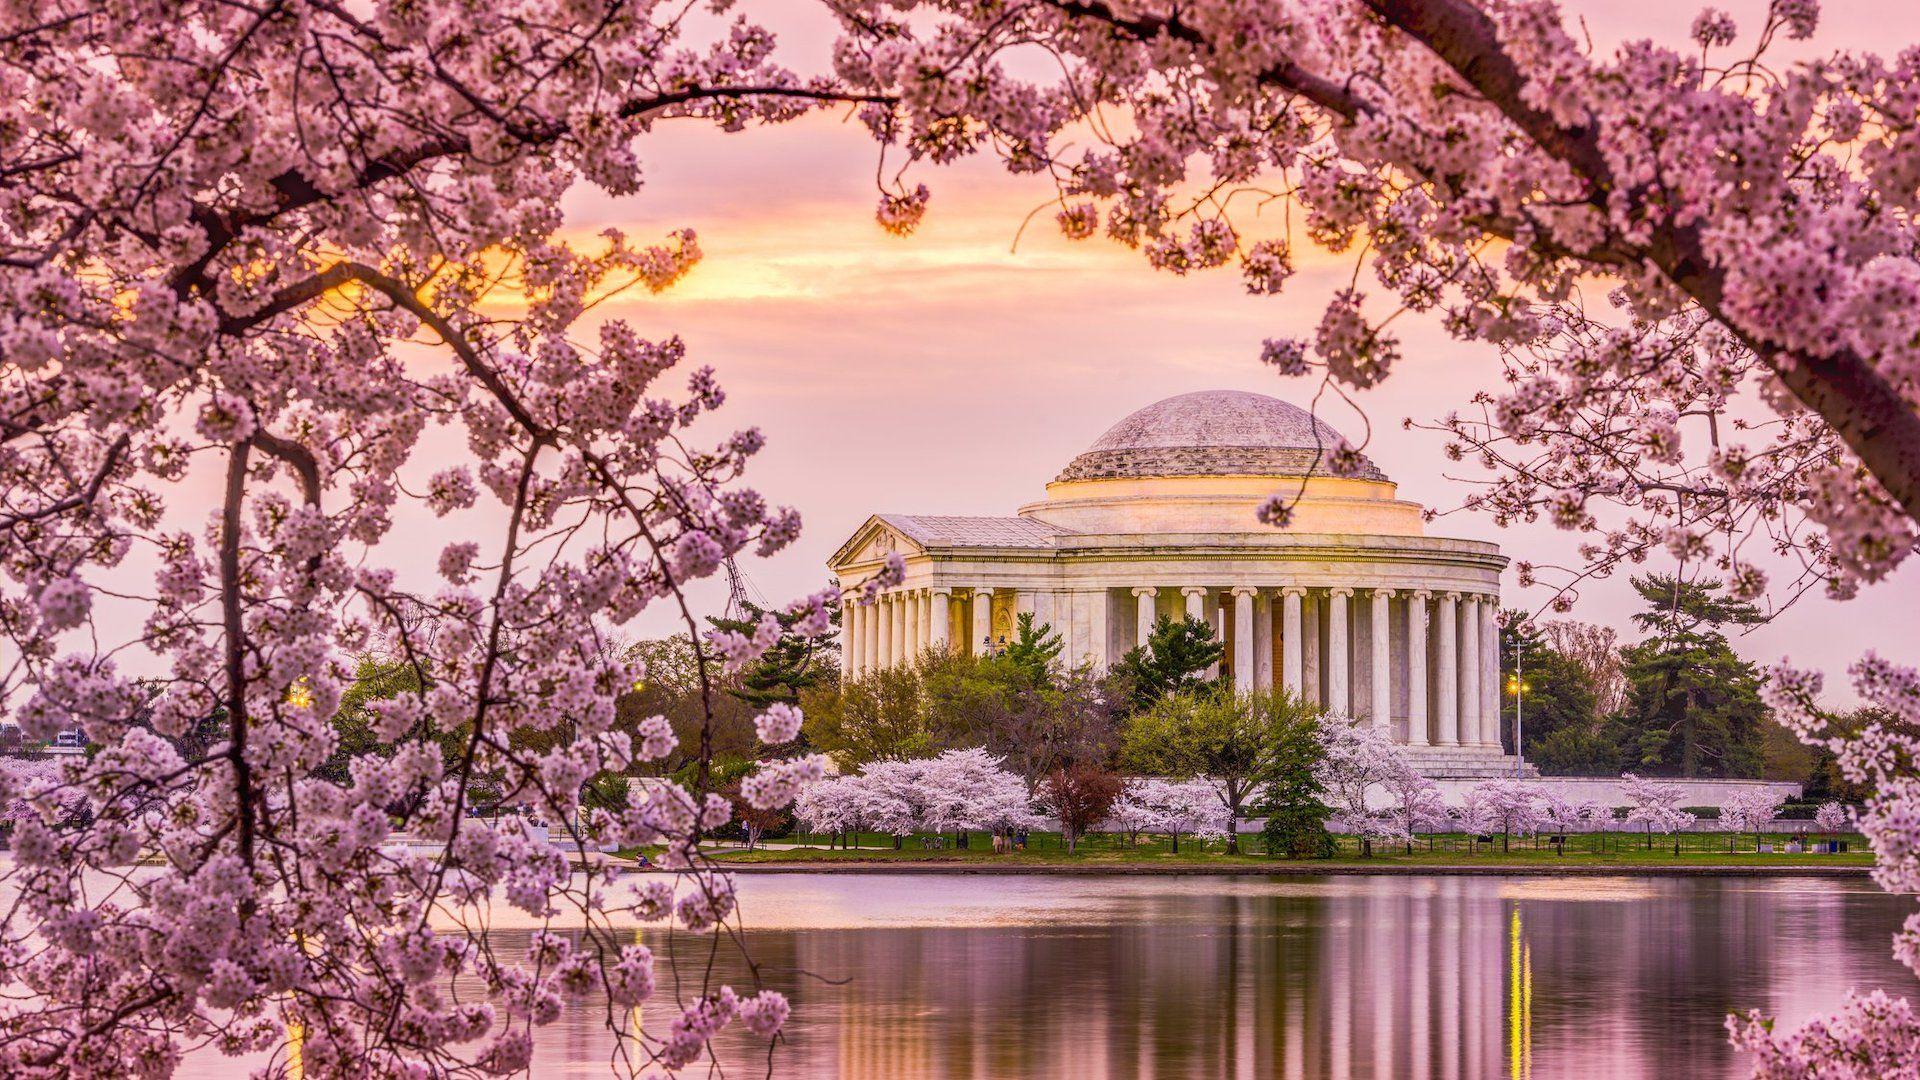 Paisajes Kentucky Busqueda De Google Cherry Blossom Festival Dc Cherry Blossom Pictures Cherry Blossom Washington Dc